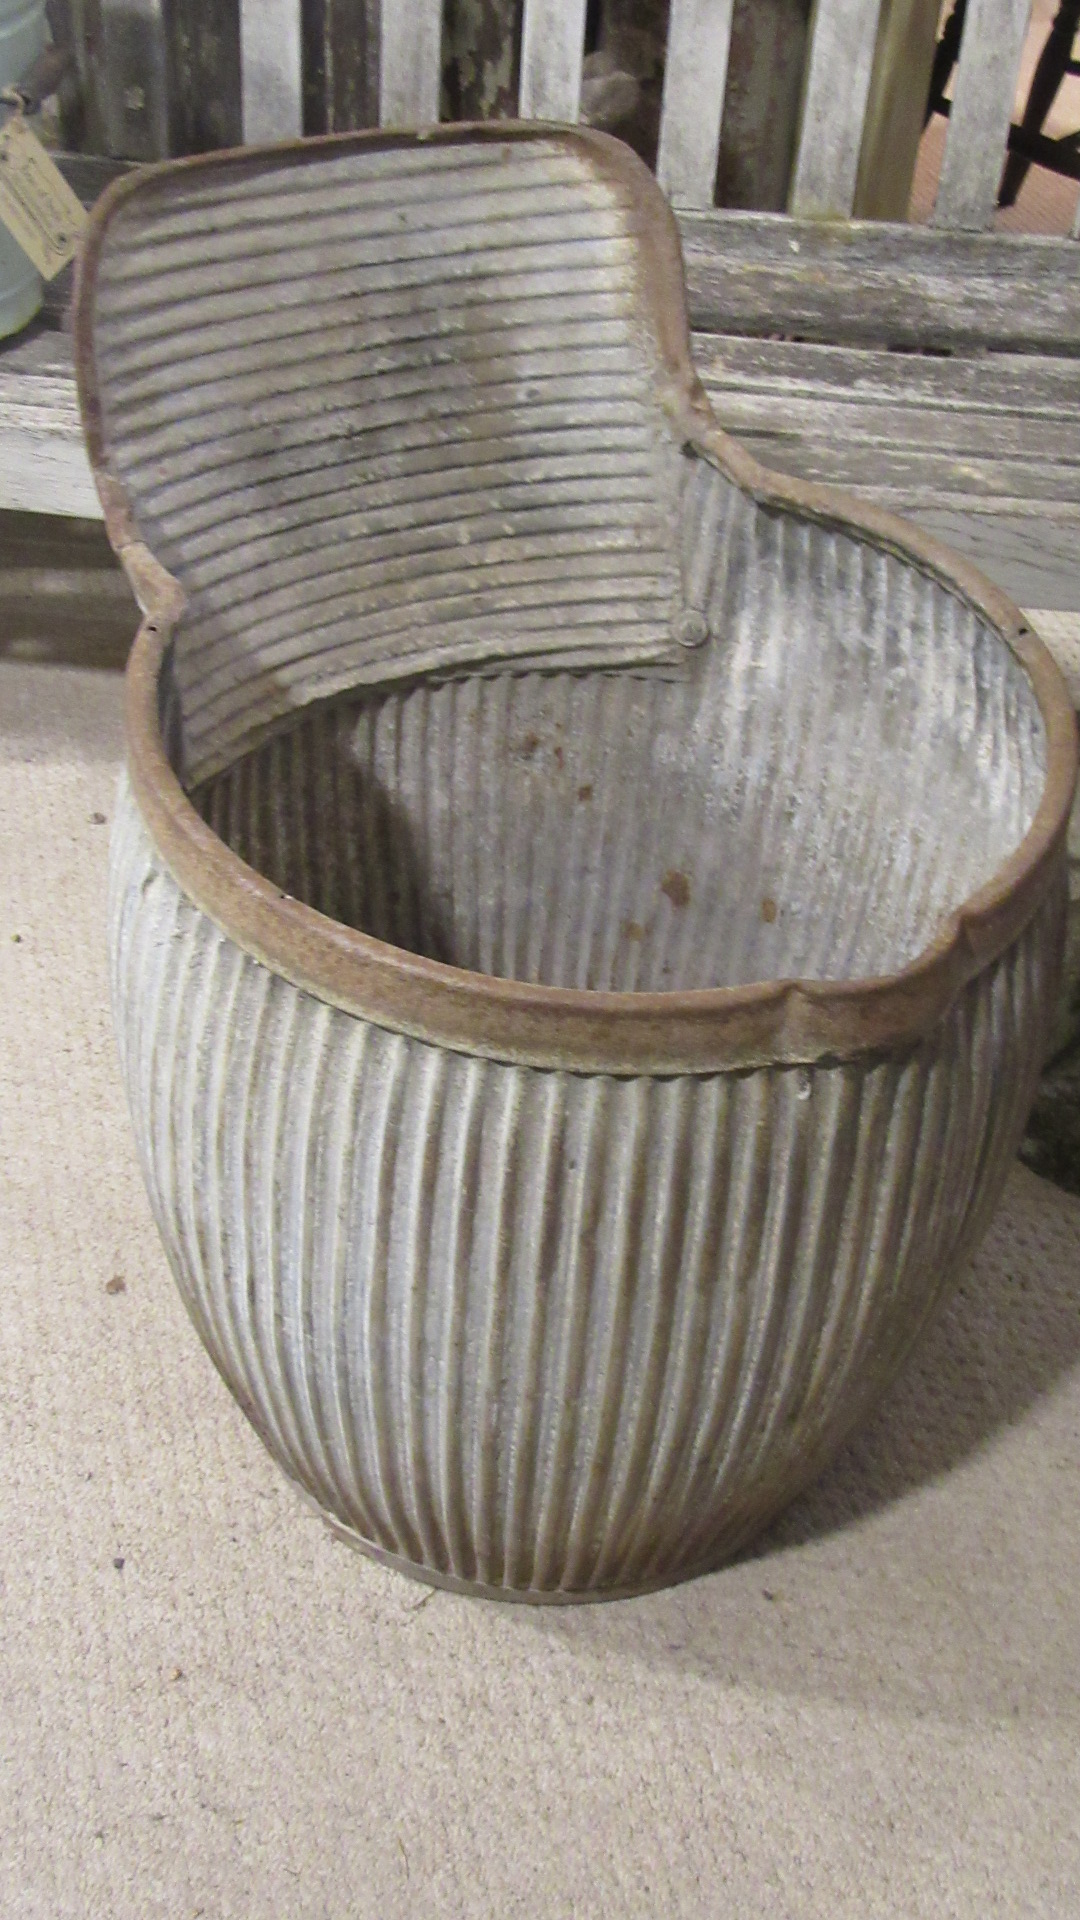 VINTAGE 1920S DOLLY TUB RARE MODEL